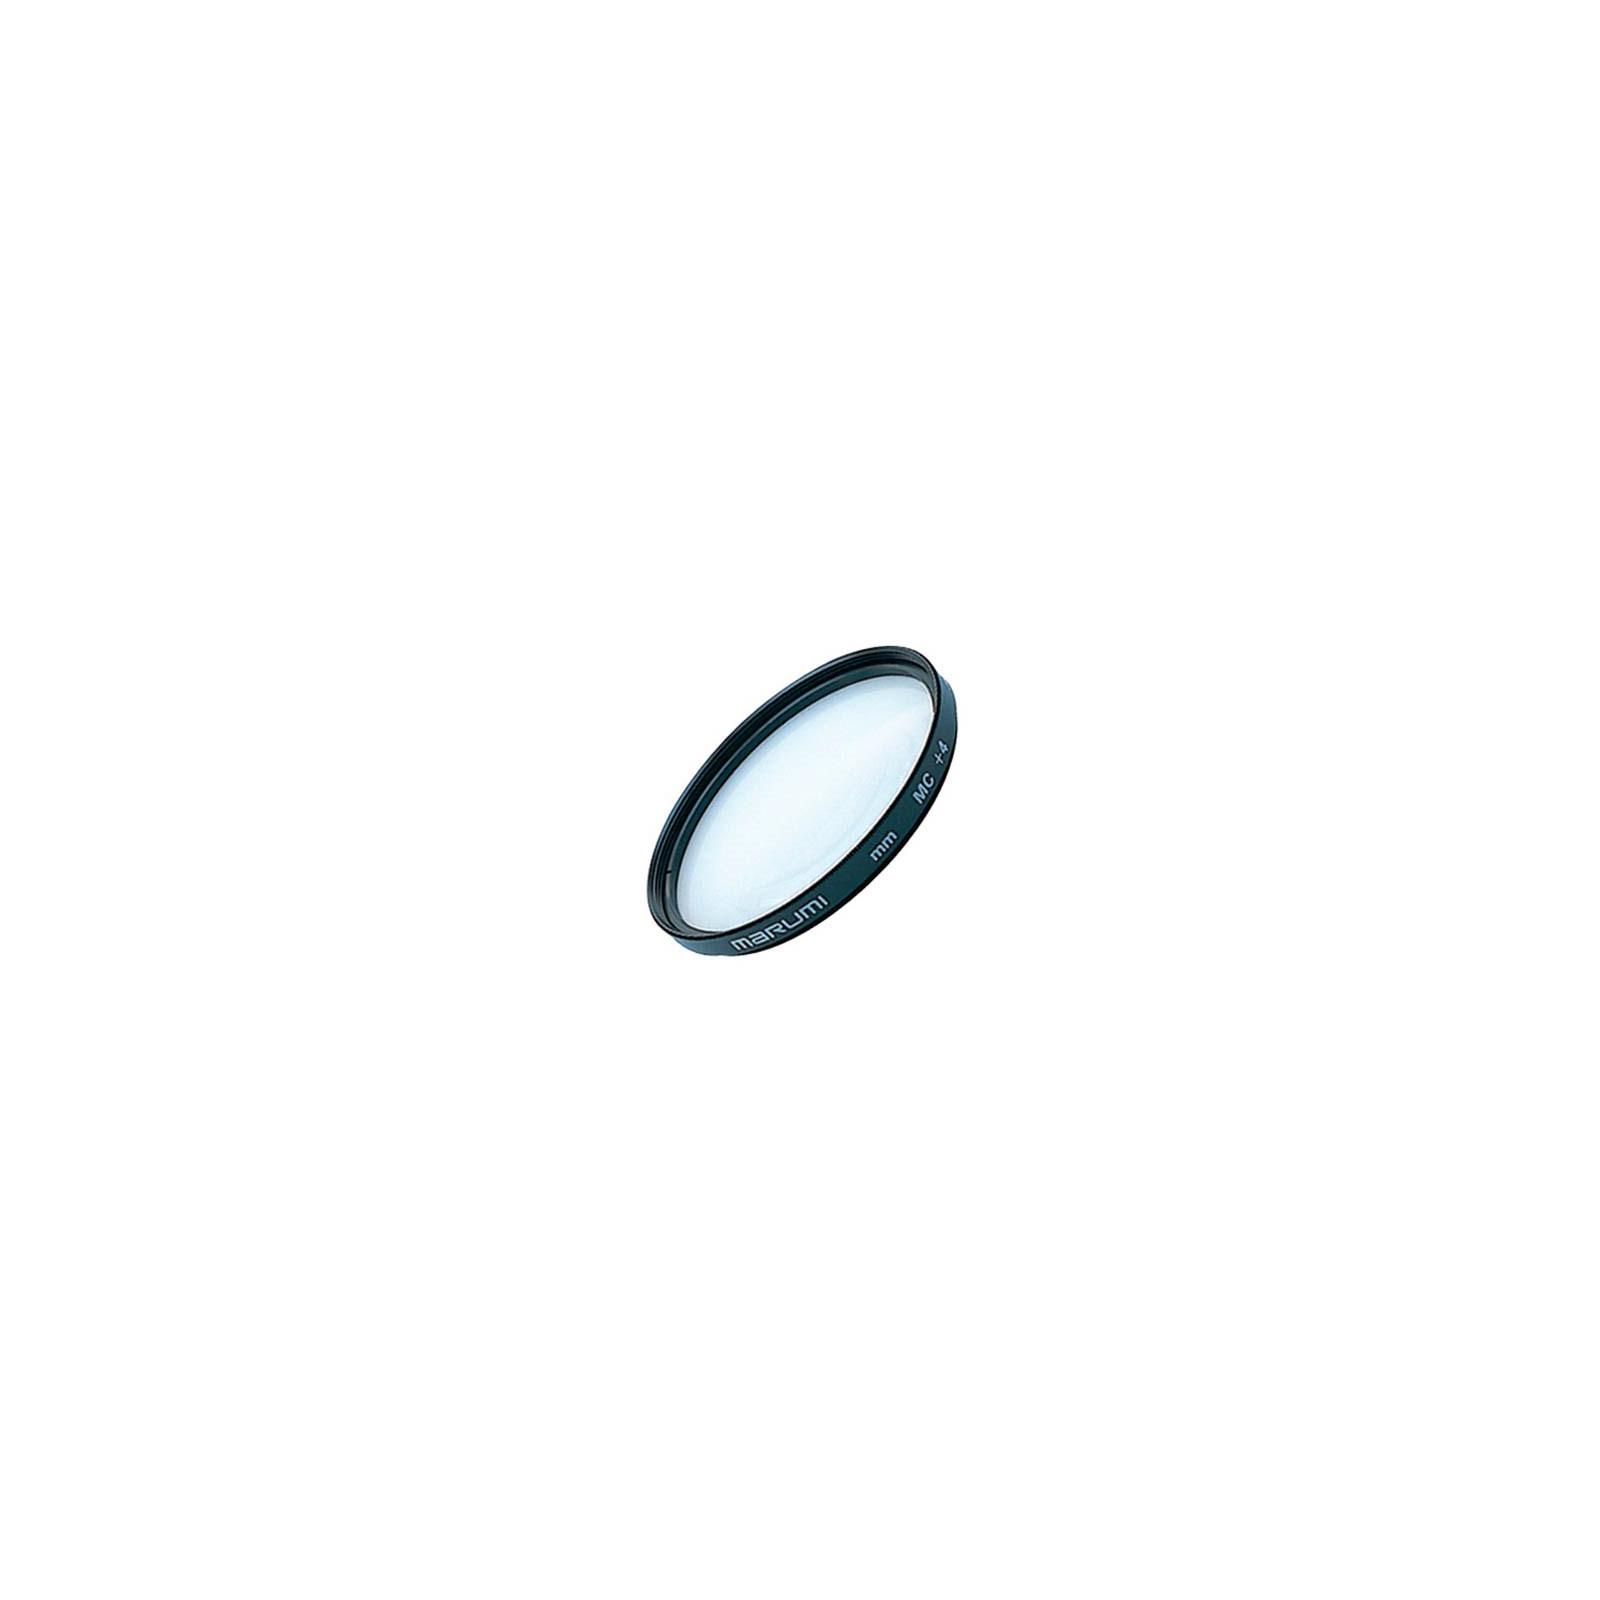 Светофильтр Marumi Close-up+4 77mm